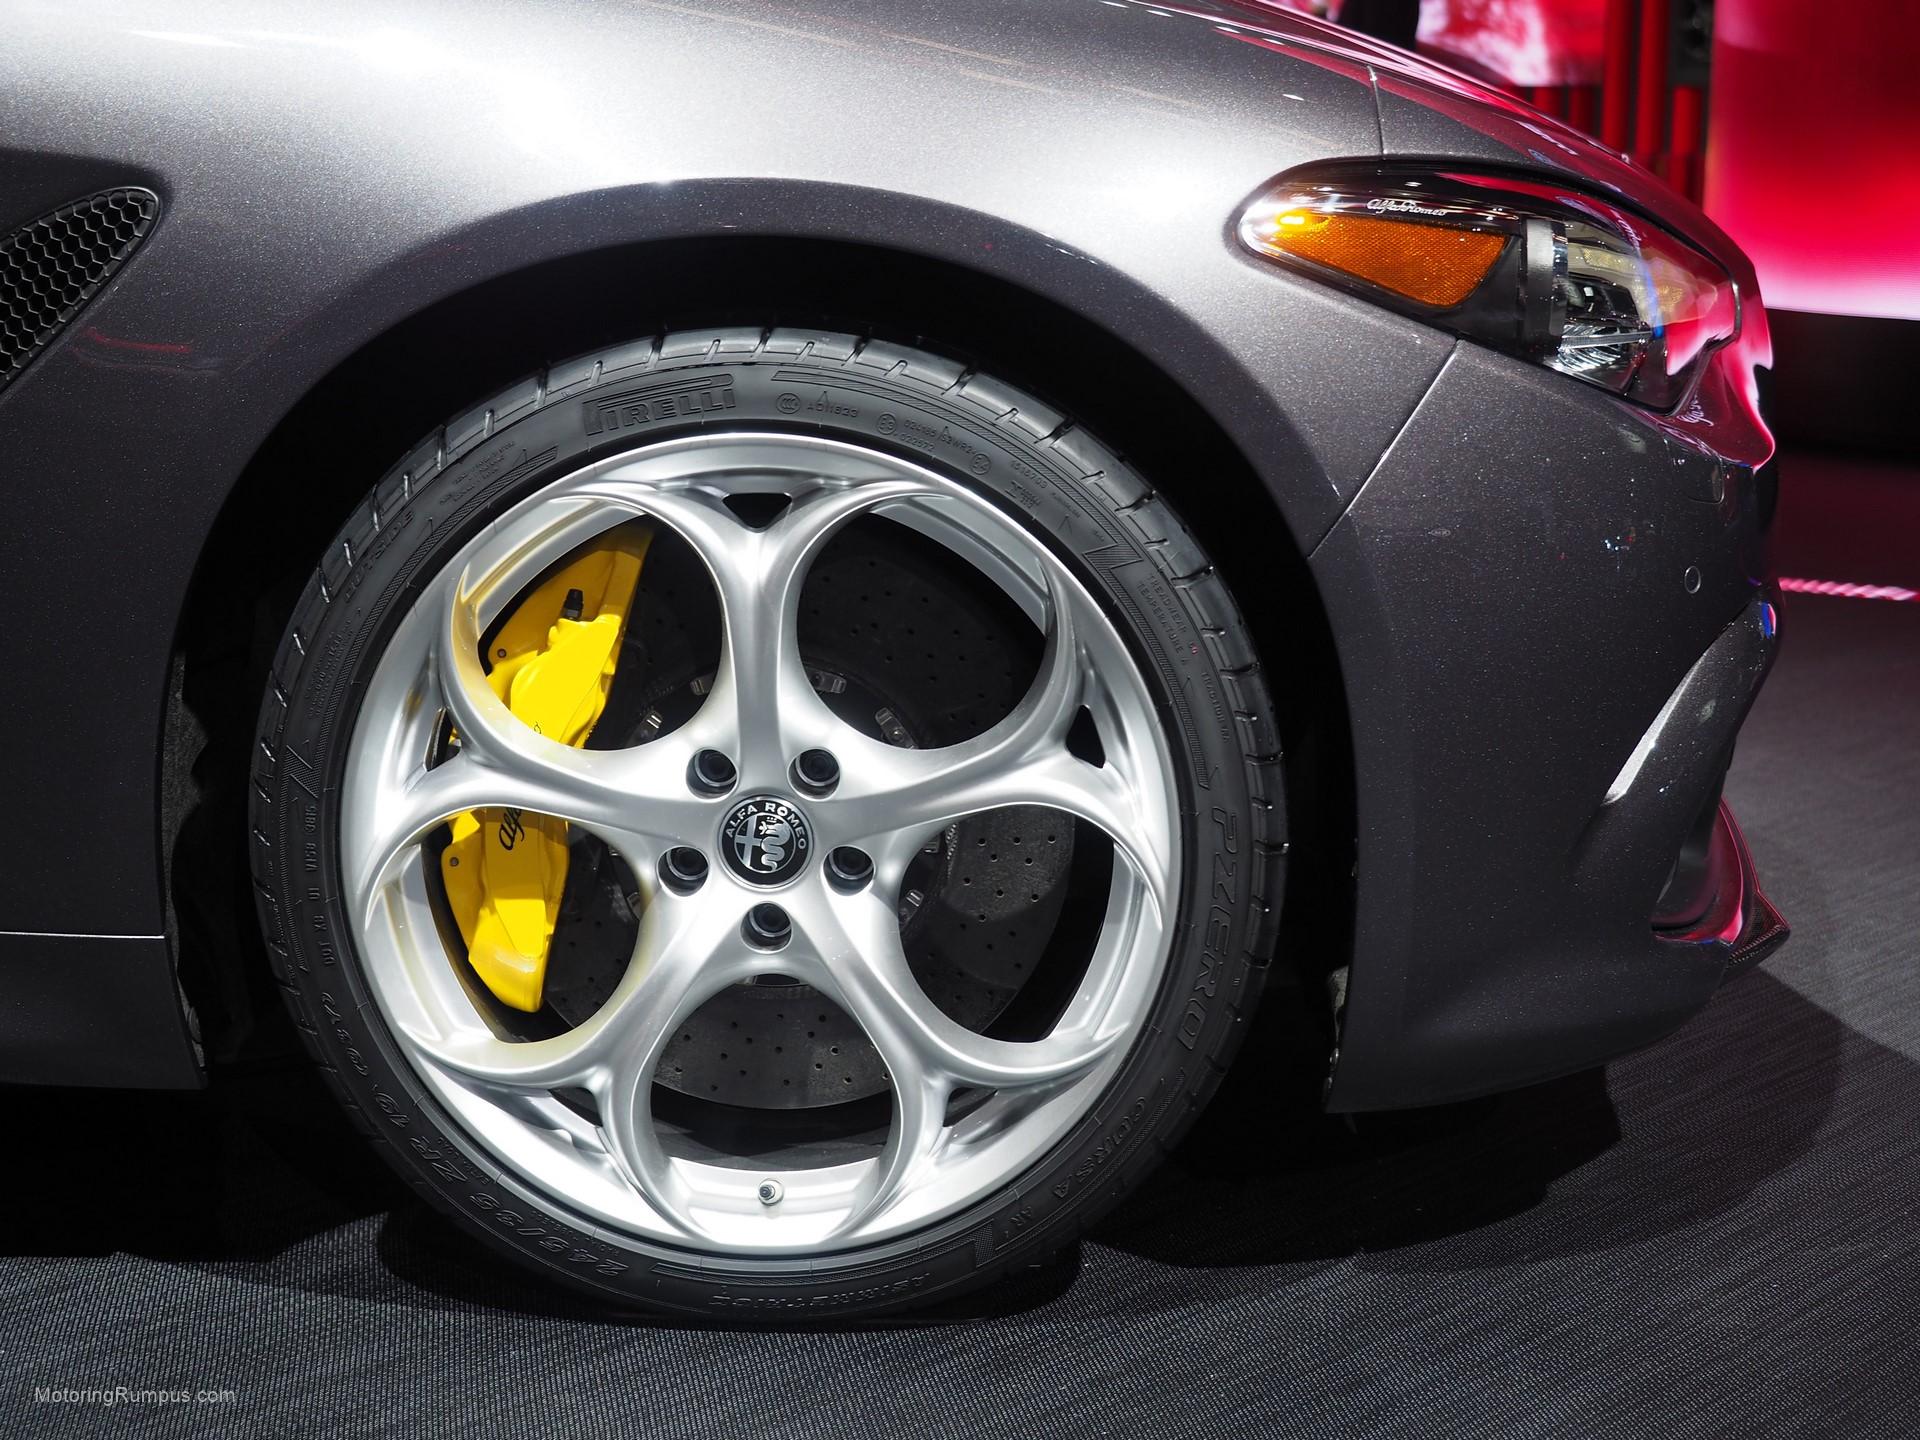 2016 Naias Alfa Romeo Giulia 19 Inch Wheel Motoring Rumpus